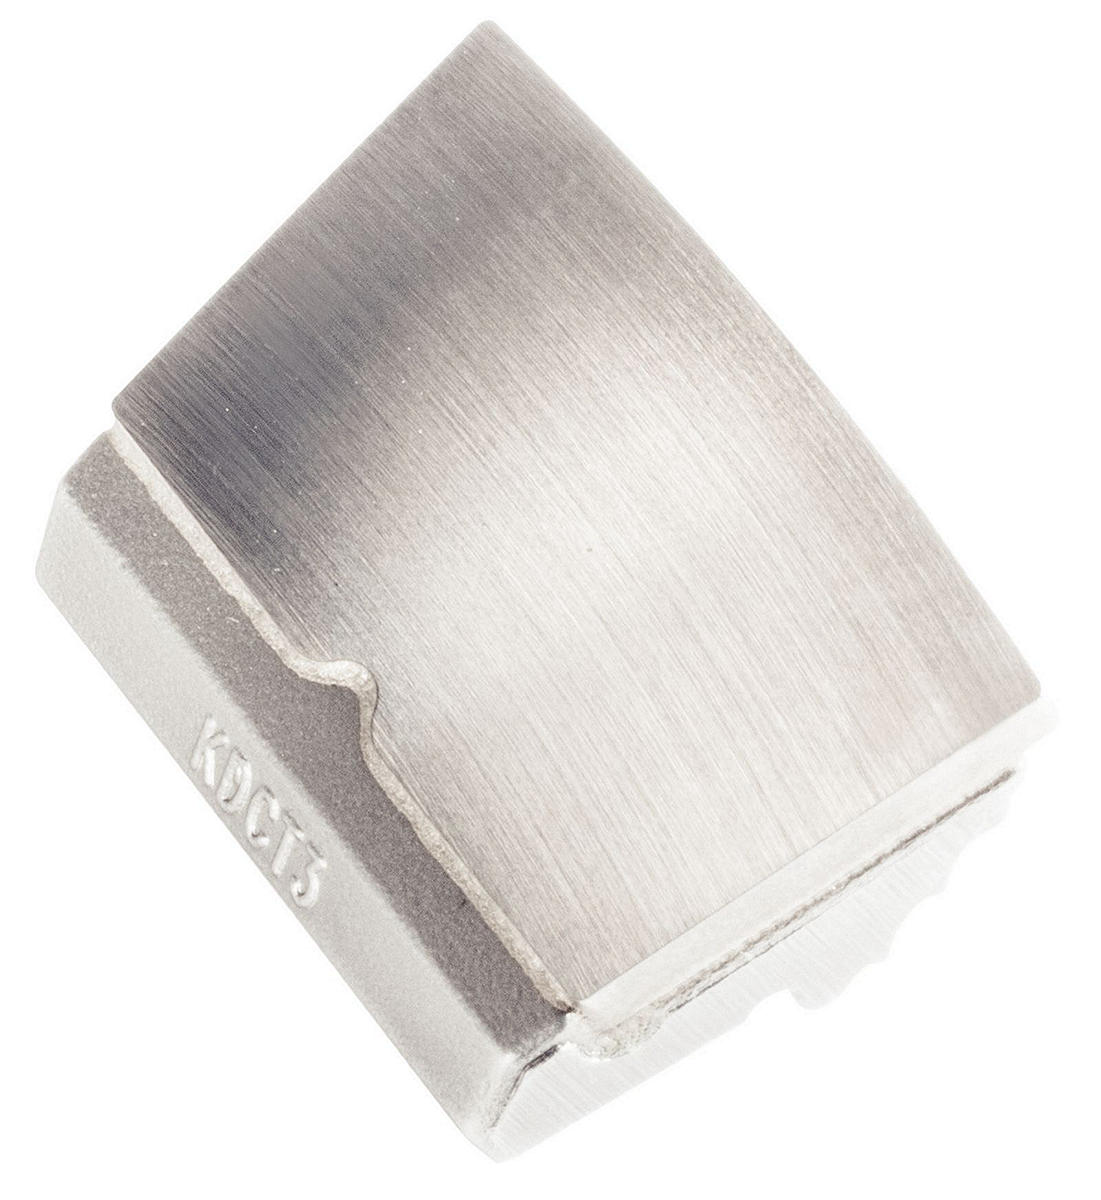 Centrifuge Tiles • KDCT3